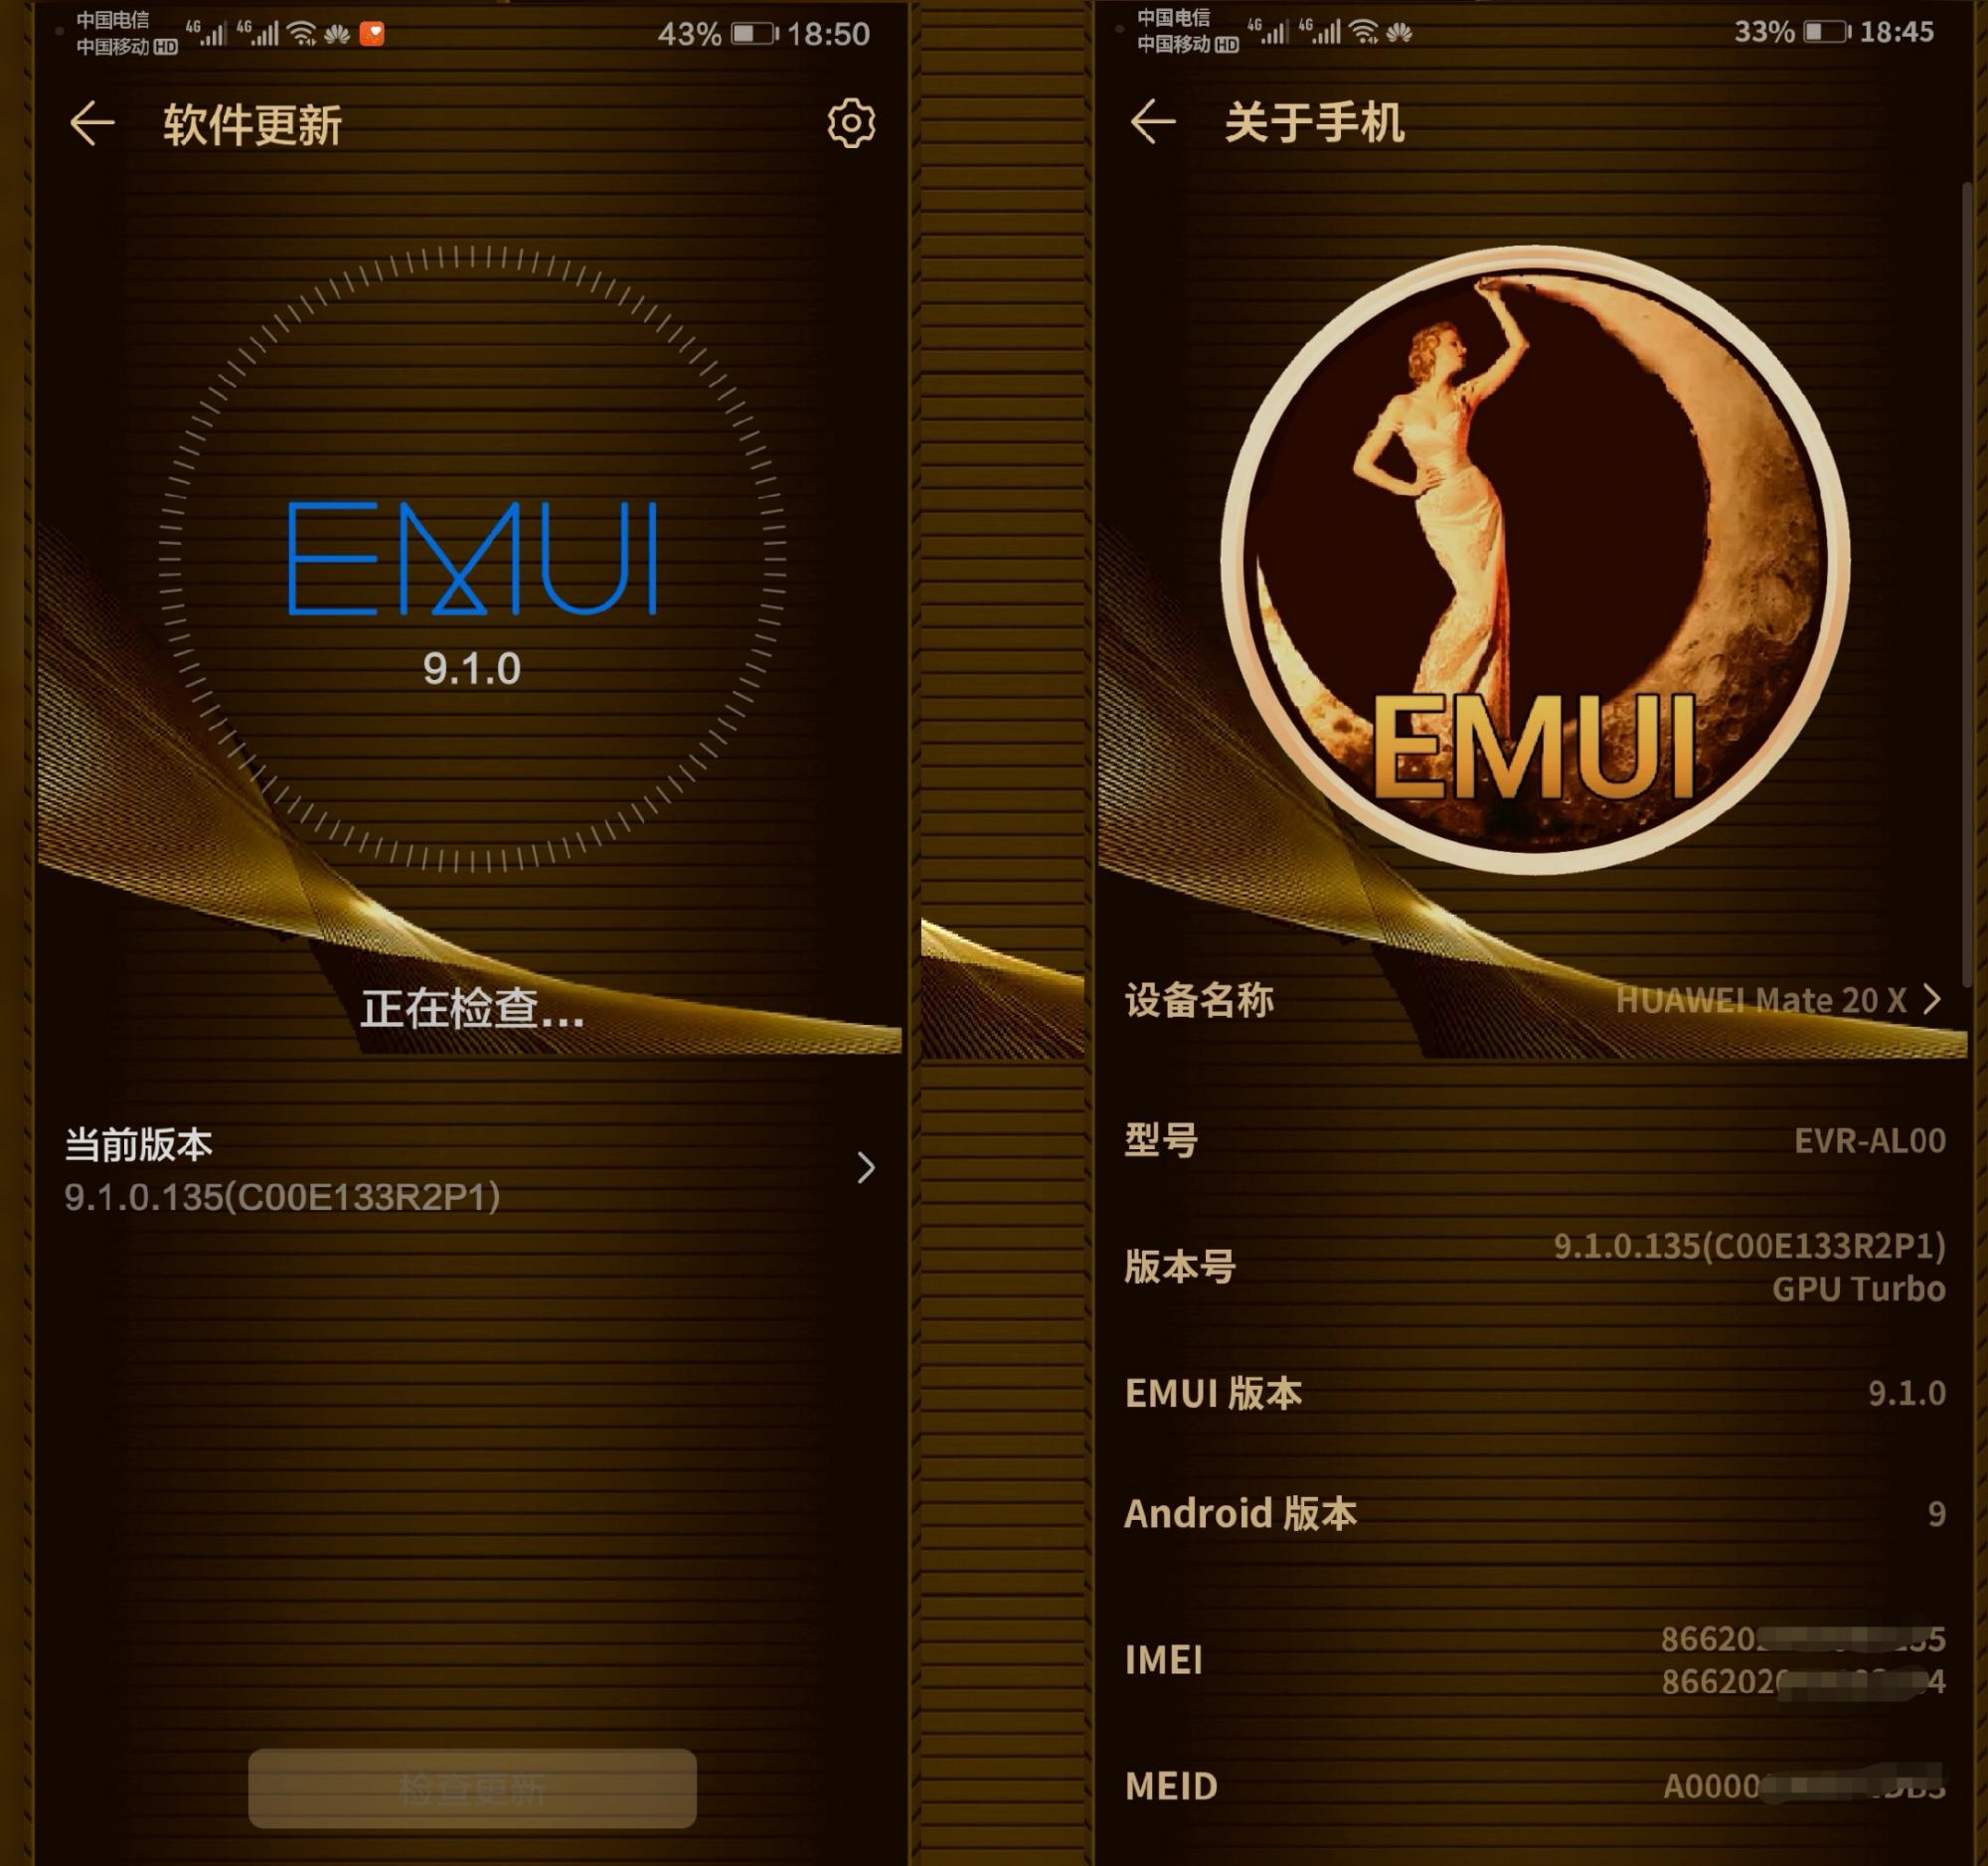 background_emui.9_1566364717566_1566377788746_1566384751981.jpg